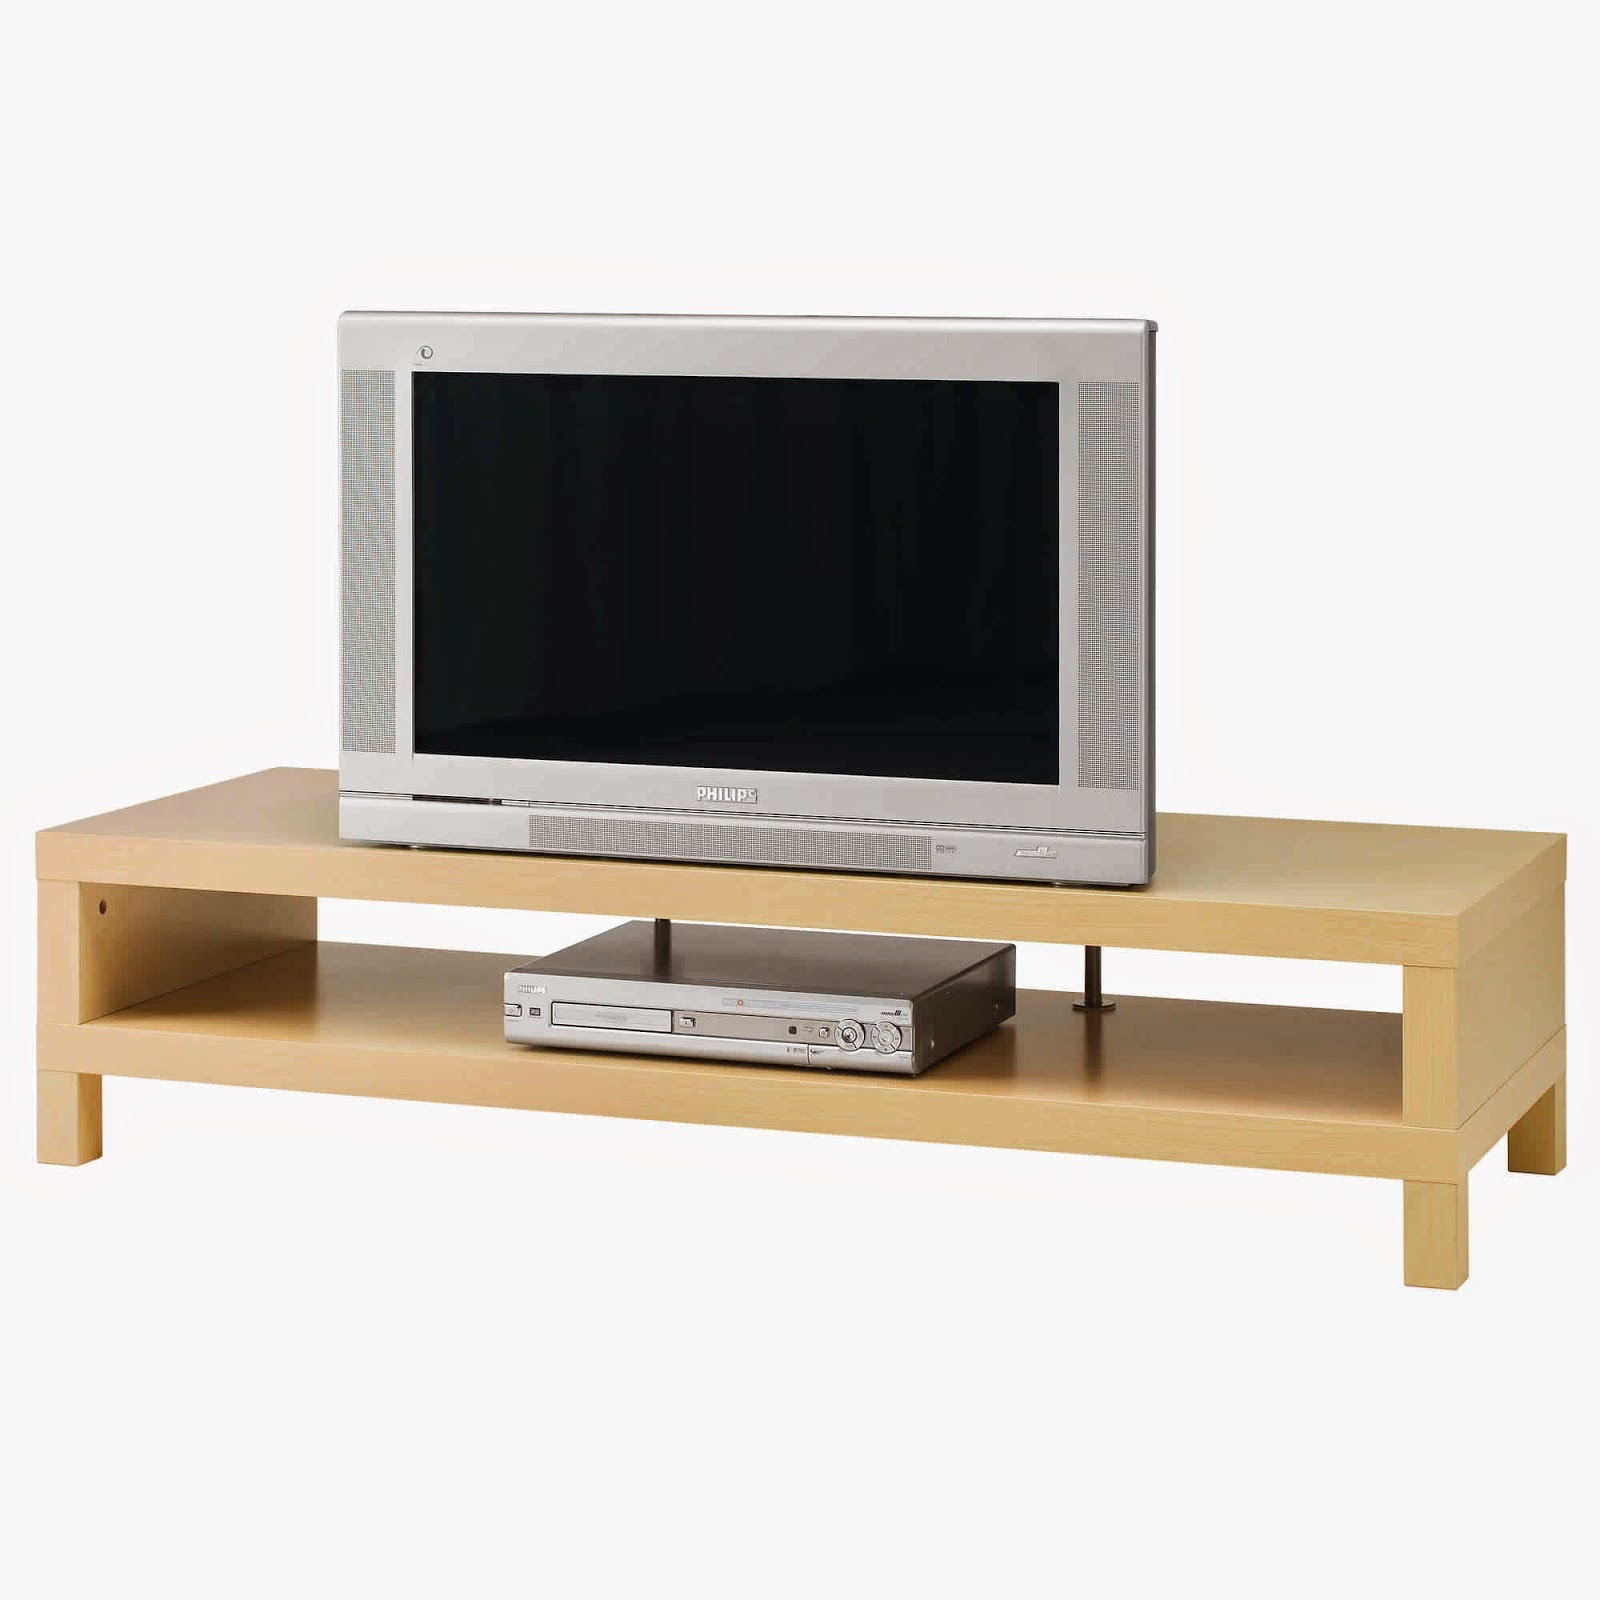 119 meuble tv metal ikea beautiful meuble tv style industriel images plasma tv pictures. Black Bedroom Furniture Sets. Home Design Ideas